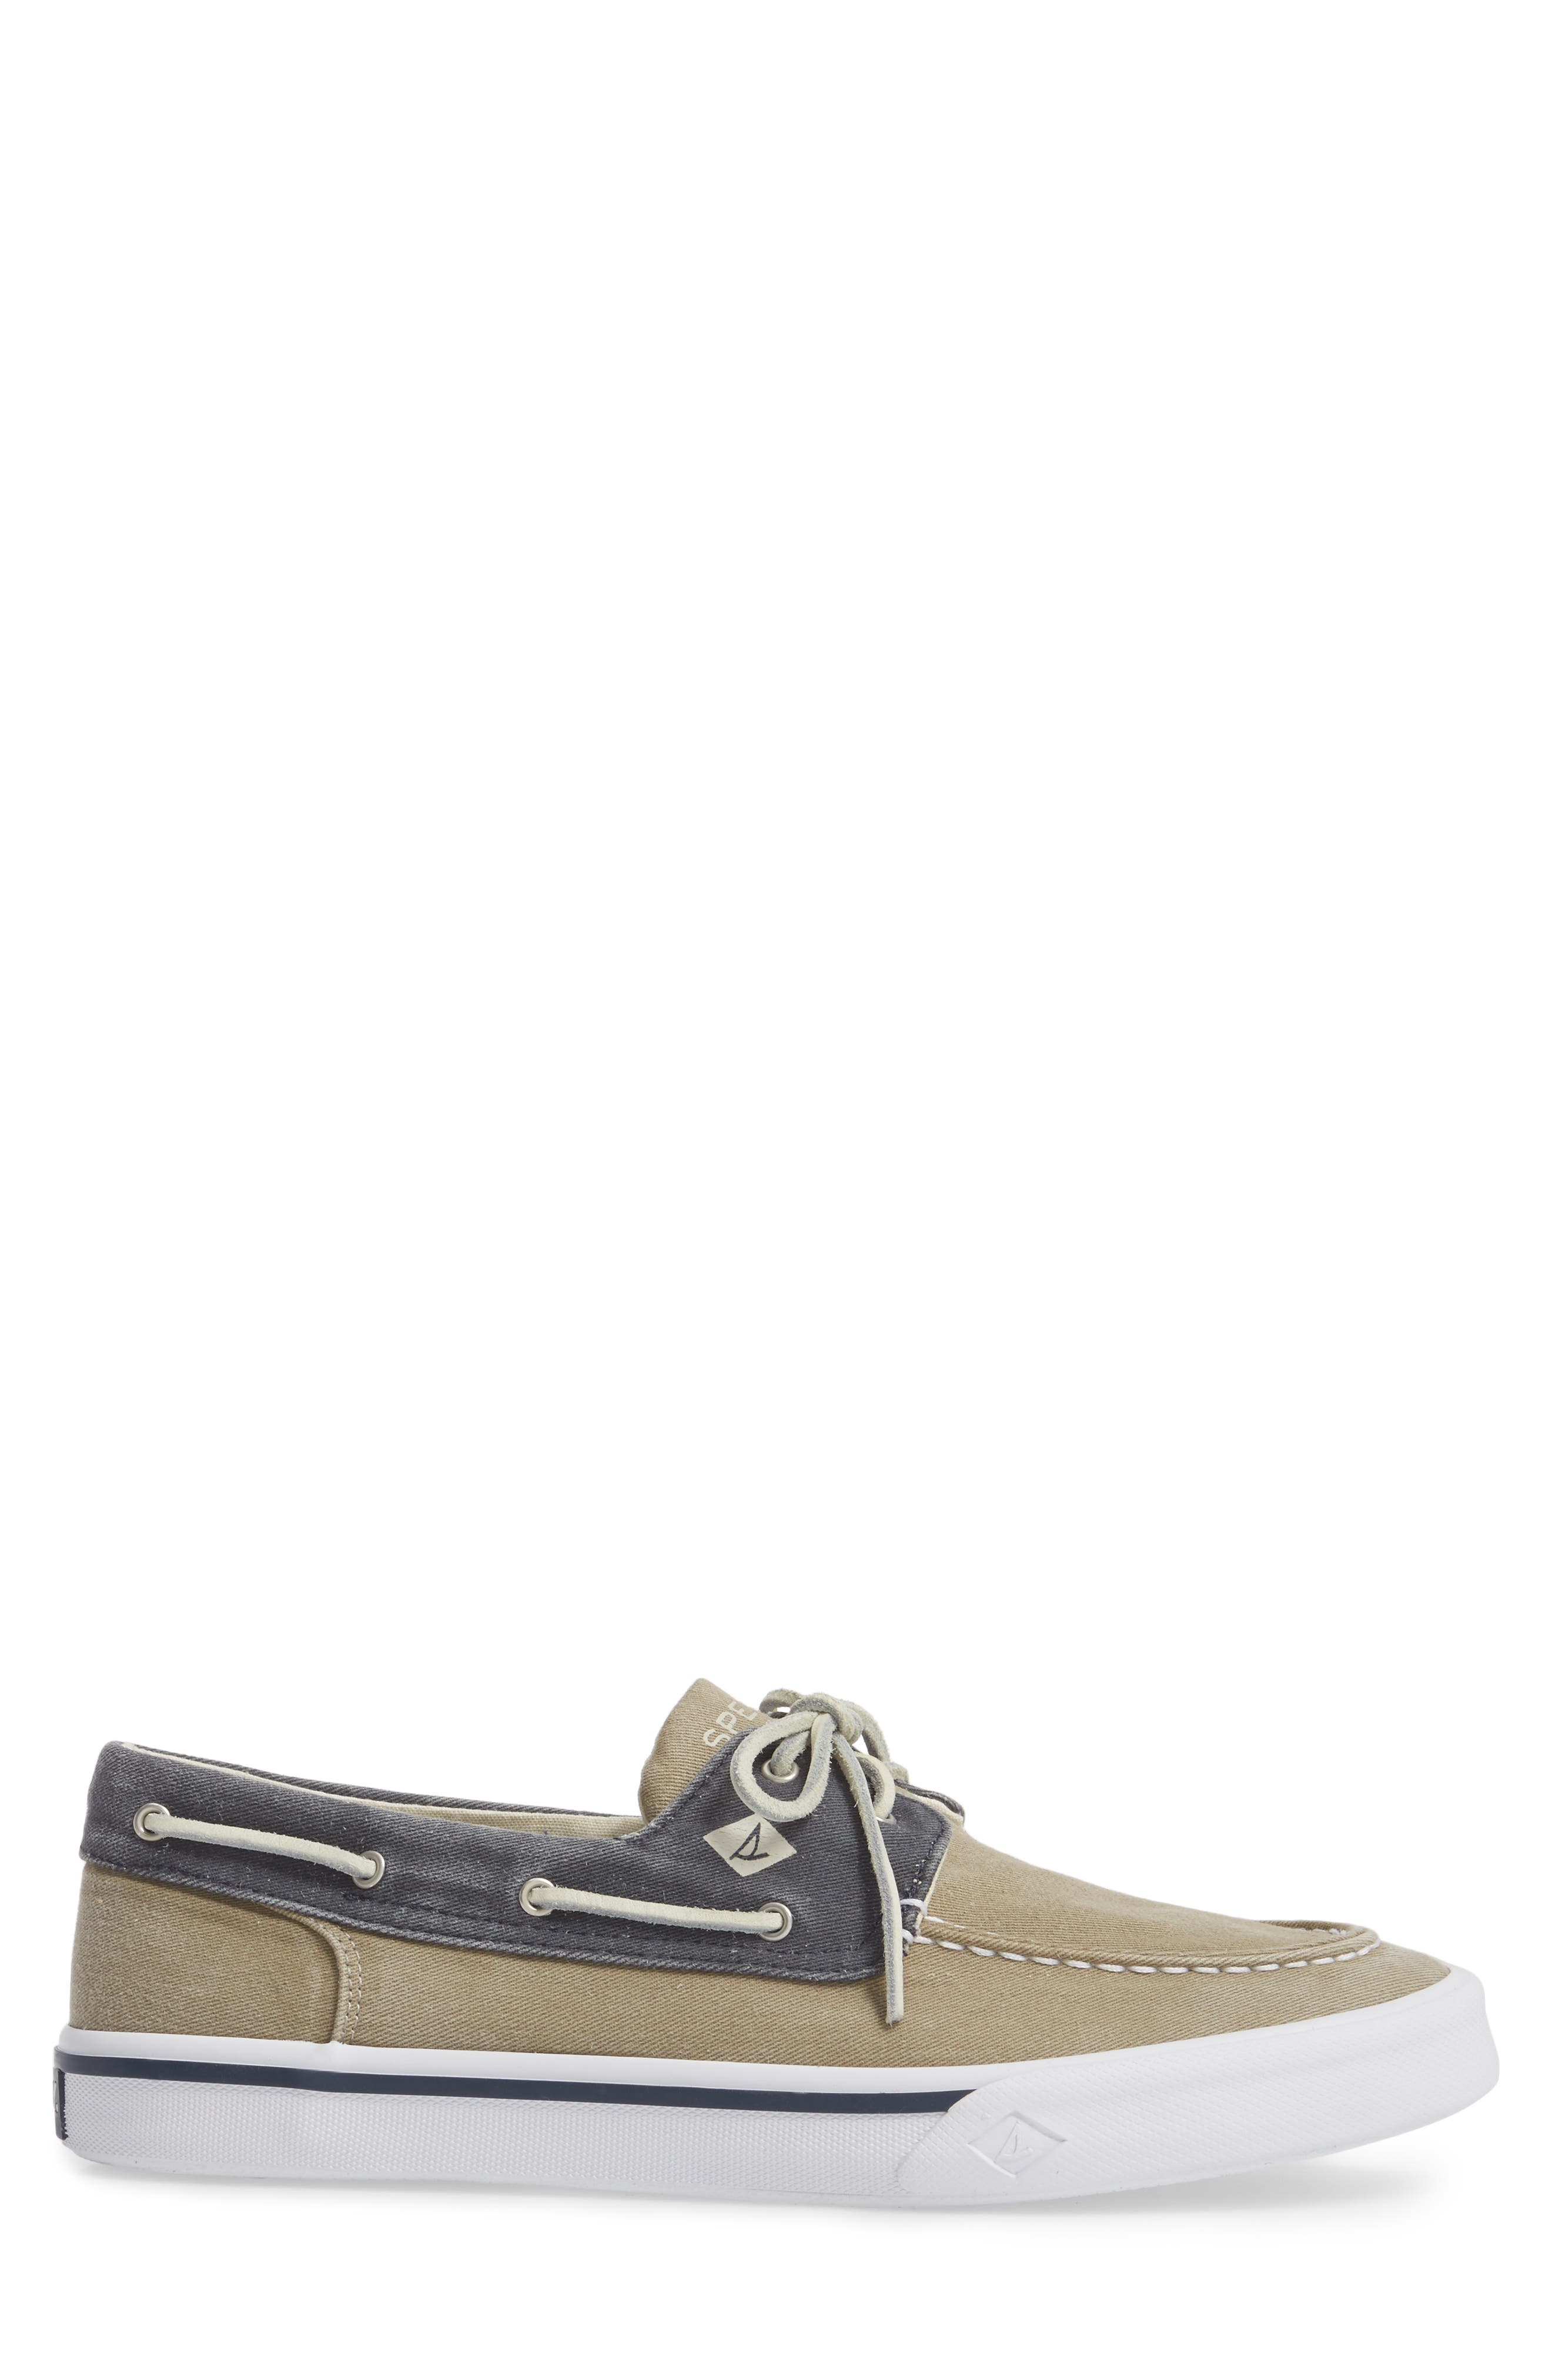 Striper II Boat Shoe,                             Alternate thumbnail 3, color,